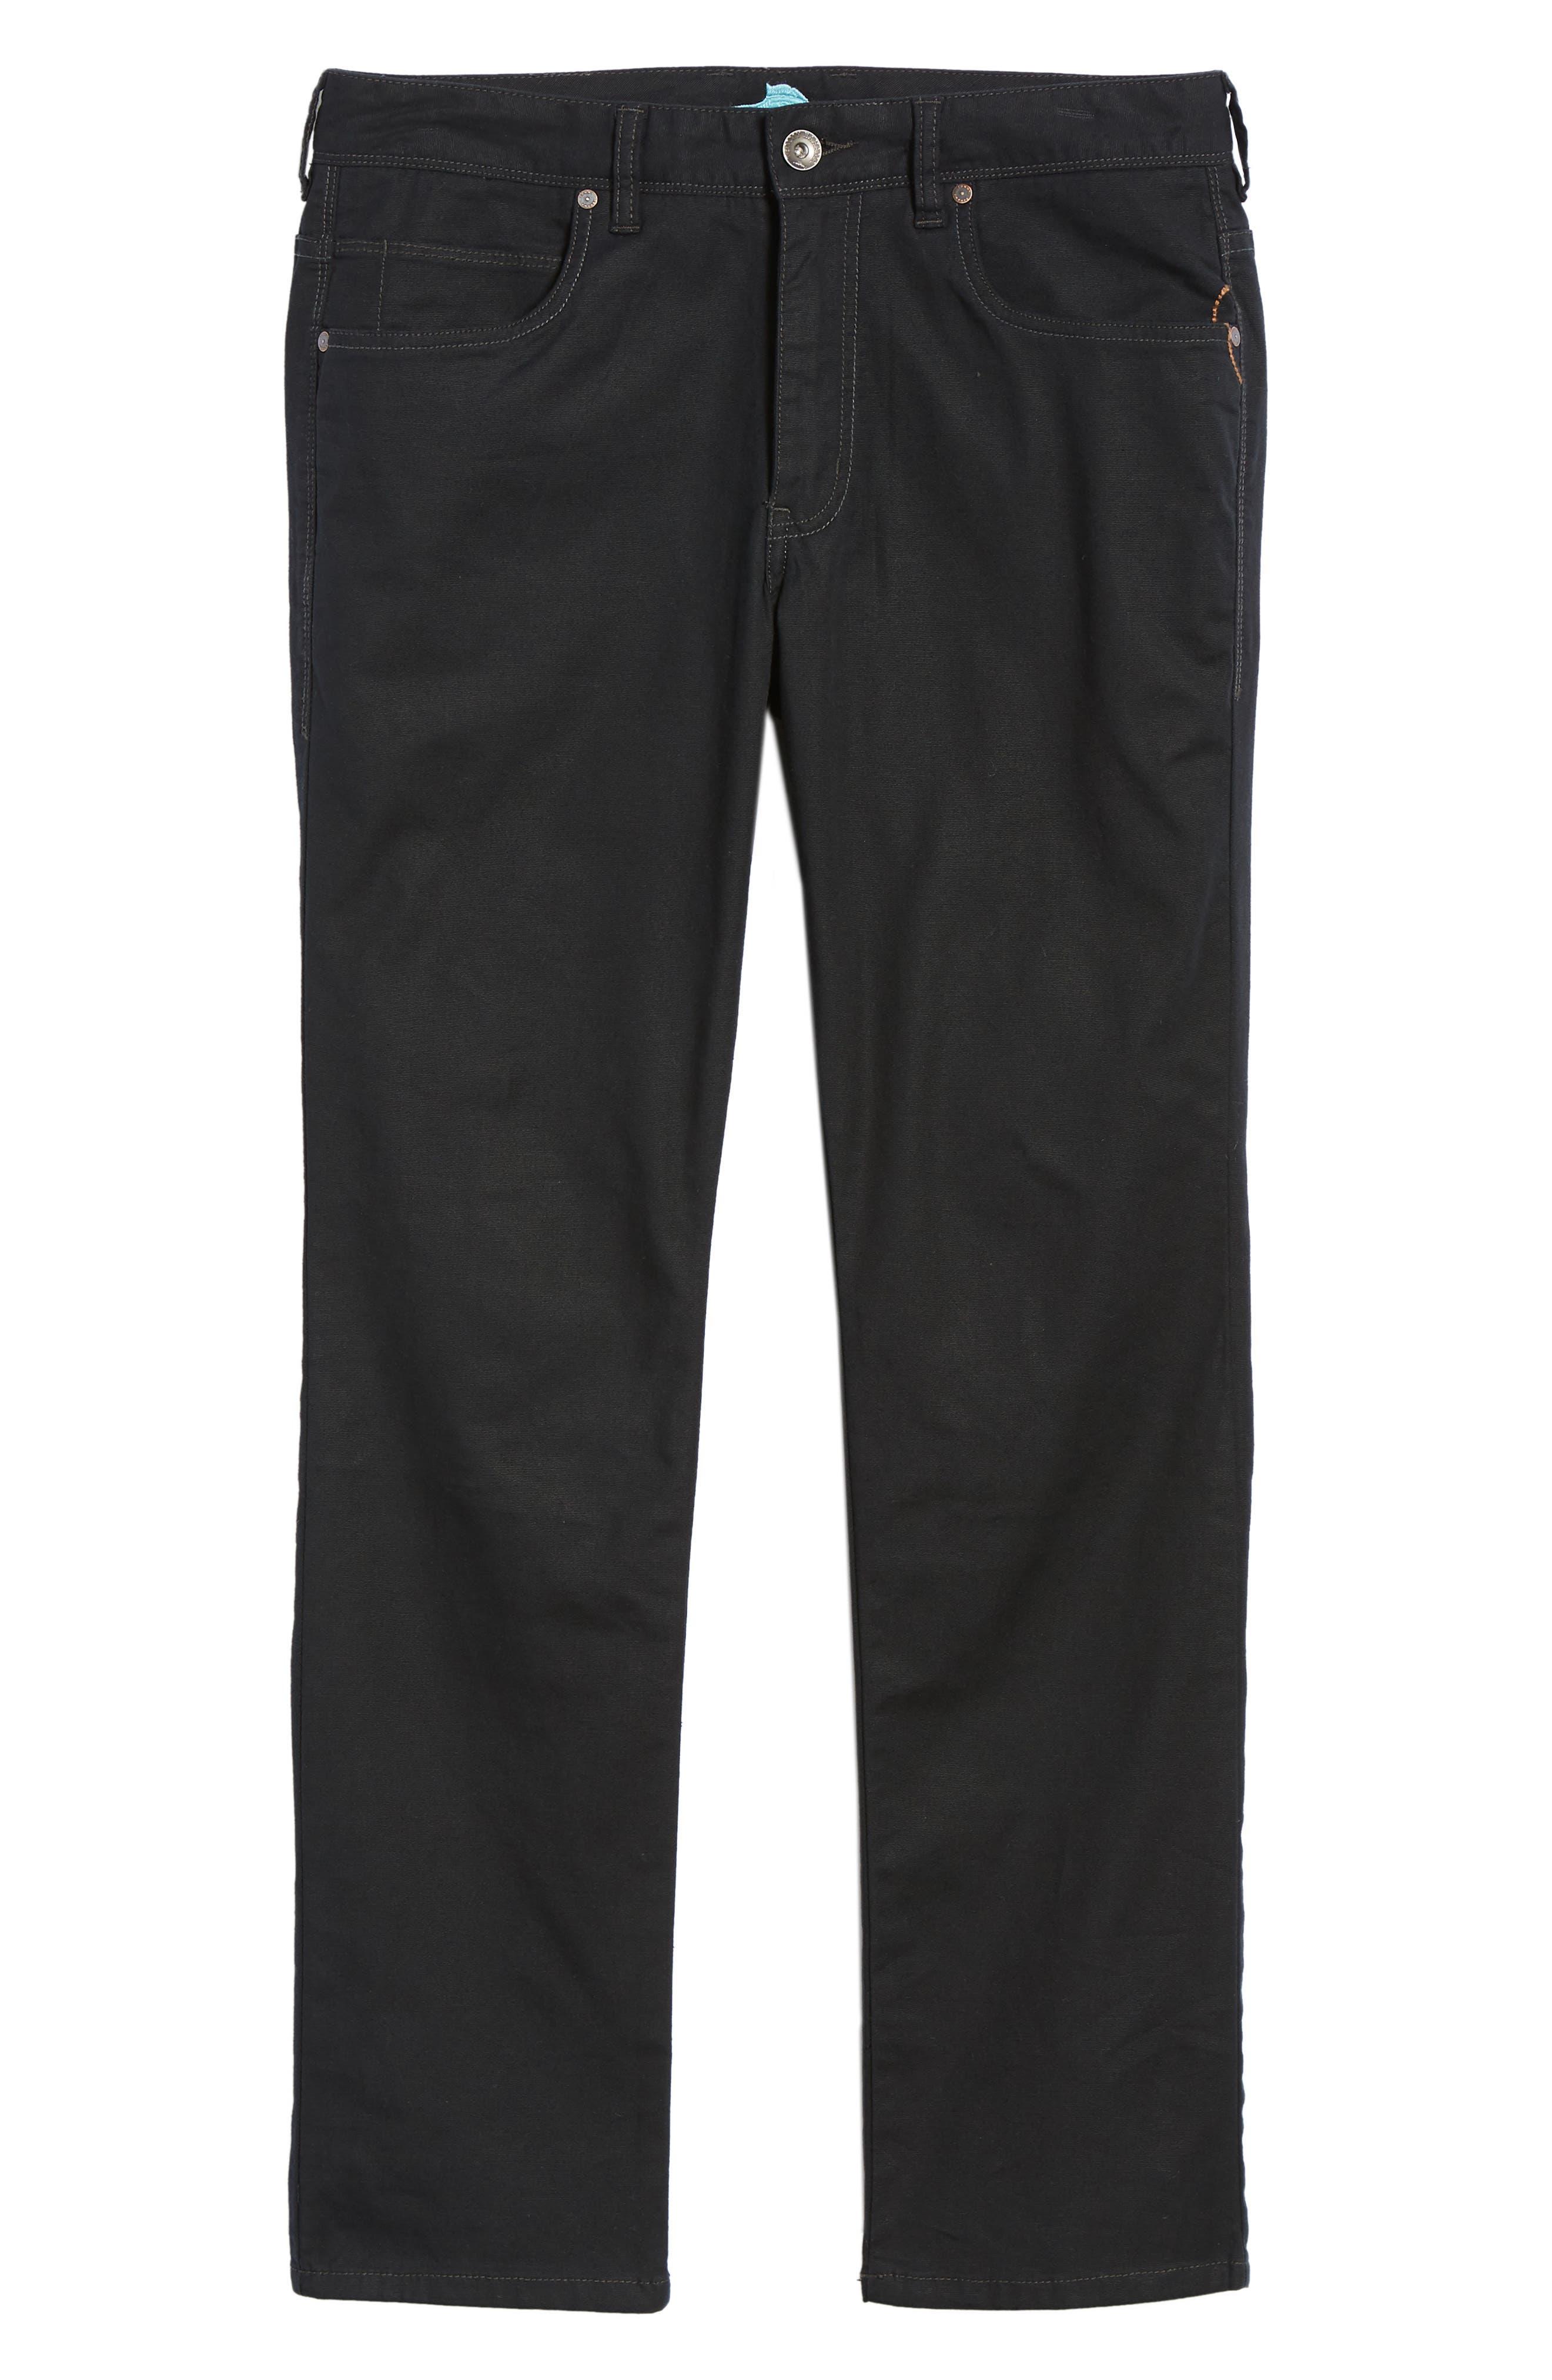 Key Isles Regular Fit Pants,                             Alternate thumbnail 6, color,                             BLACK